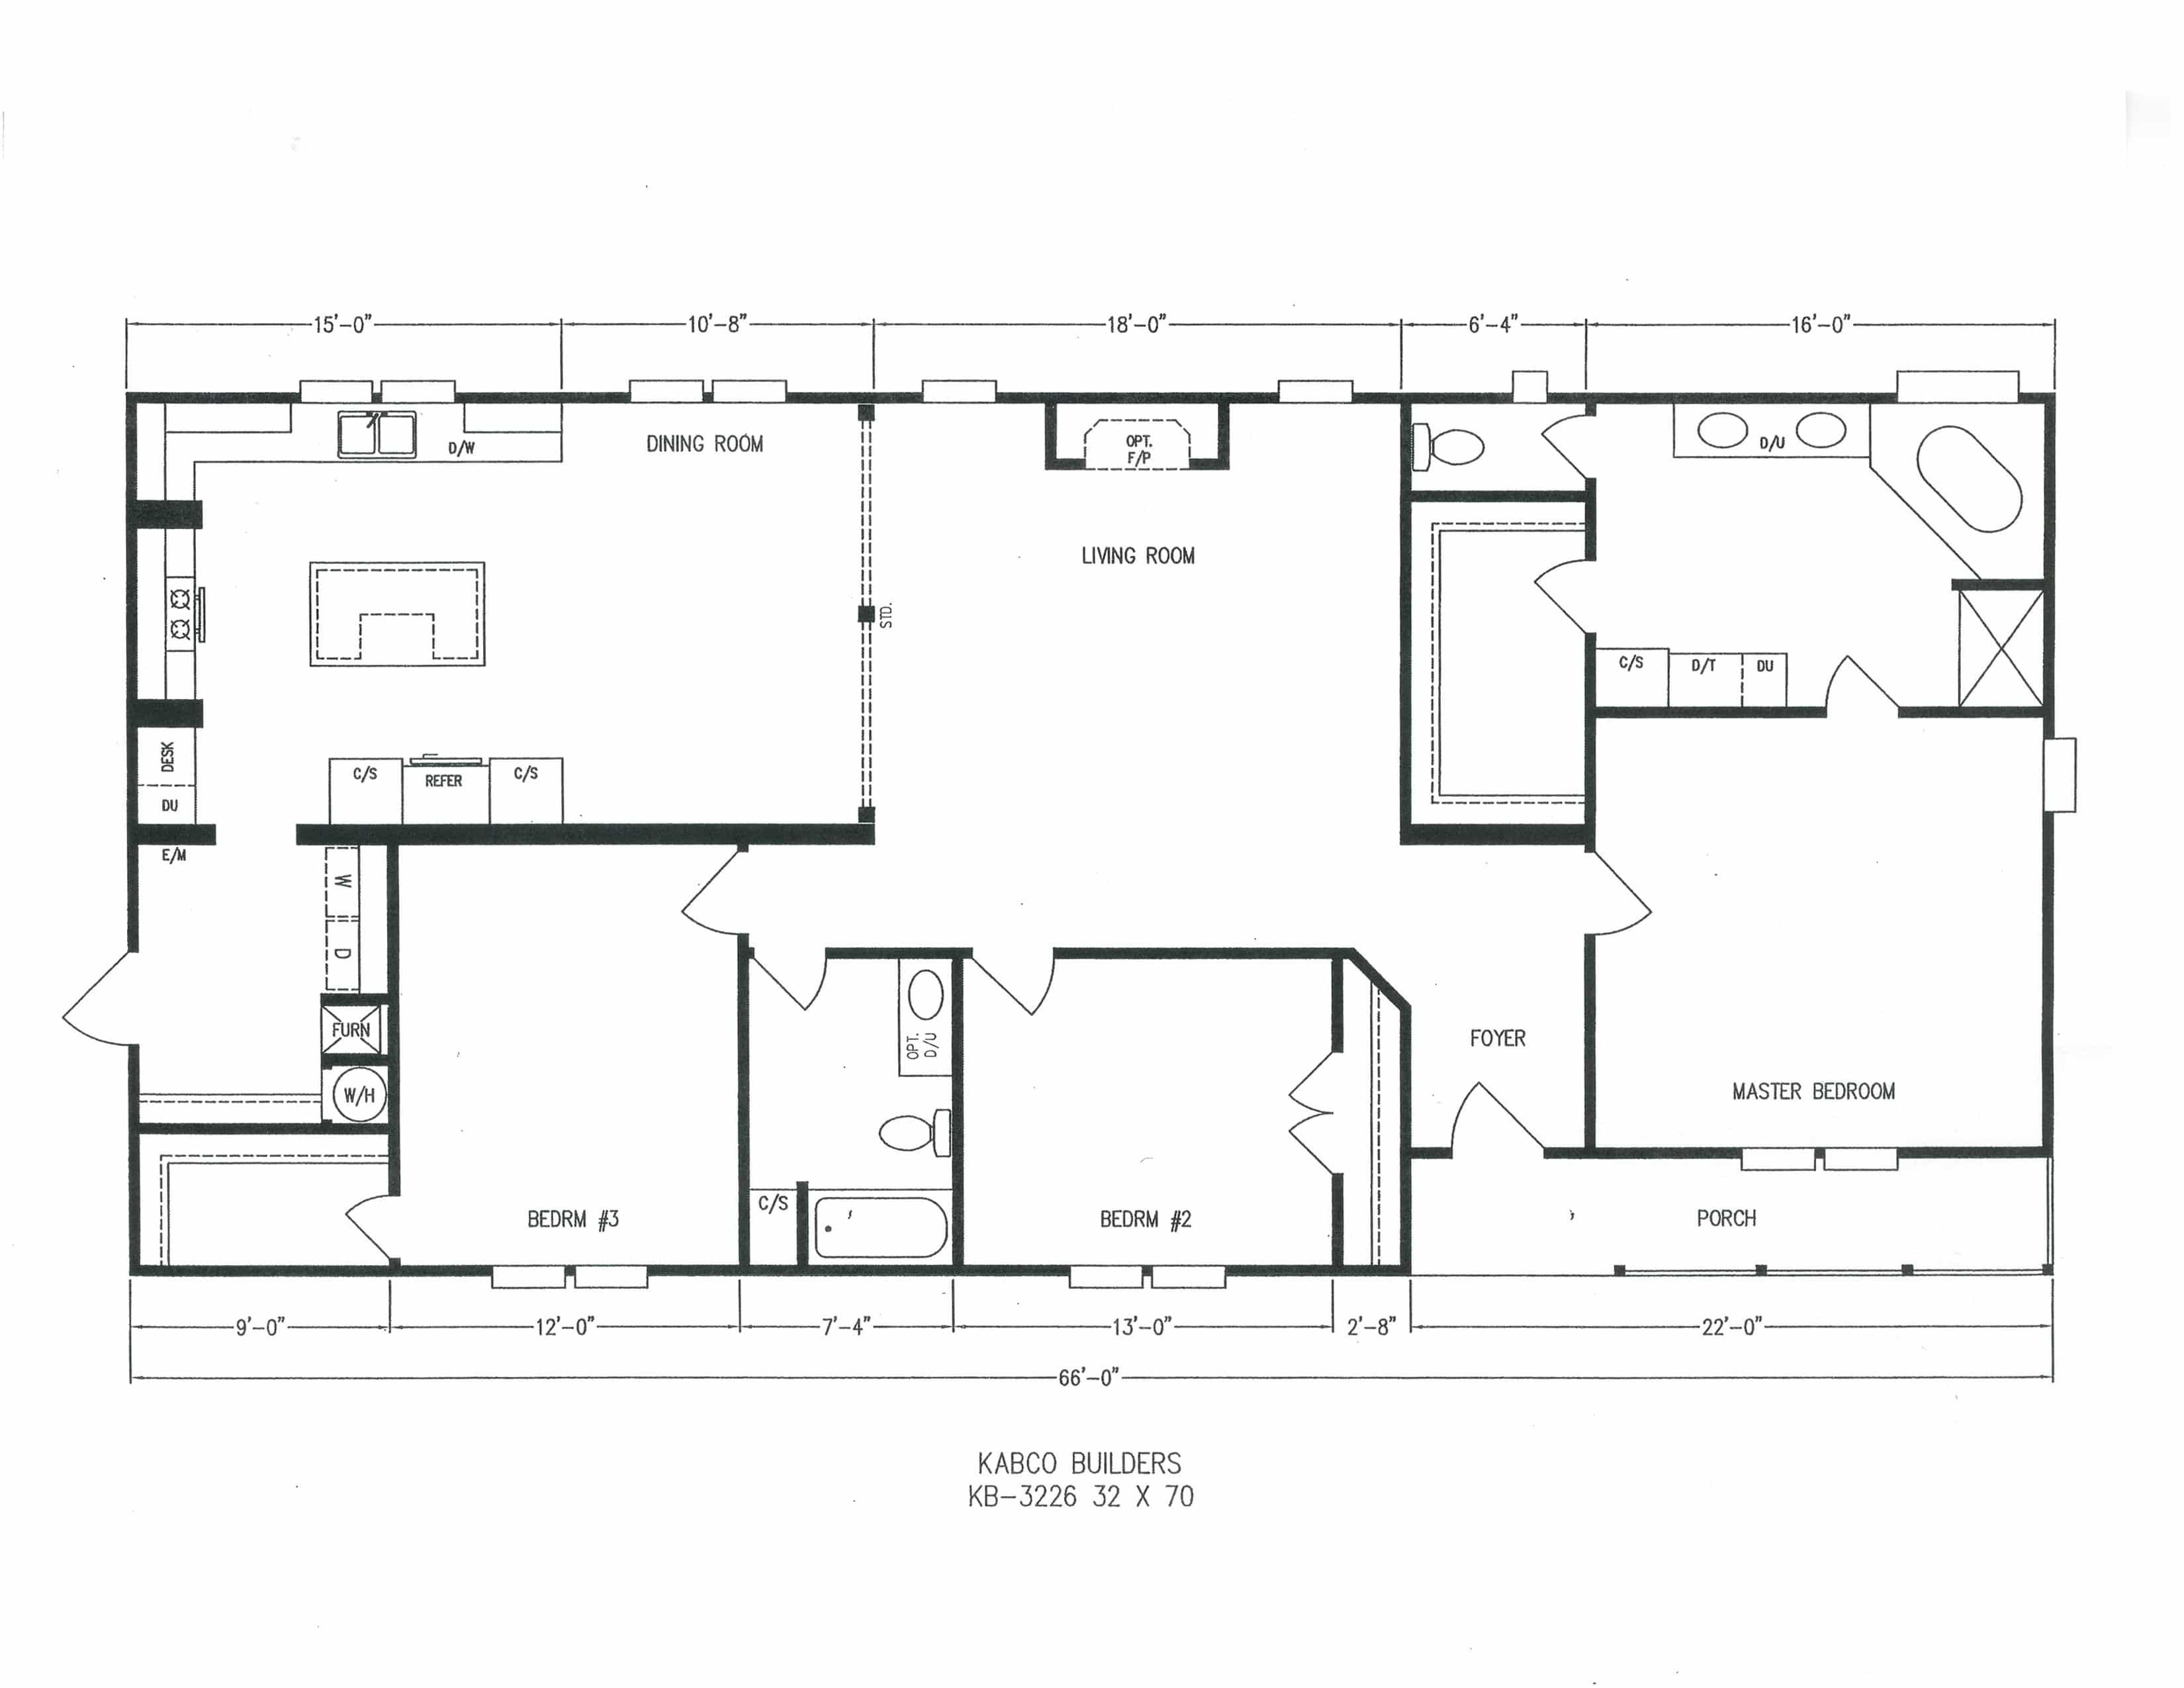 3 Bedroom Floor Plan K3226 Floor plans, Bedroom floor